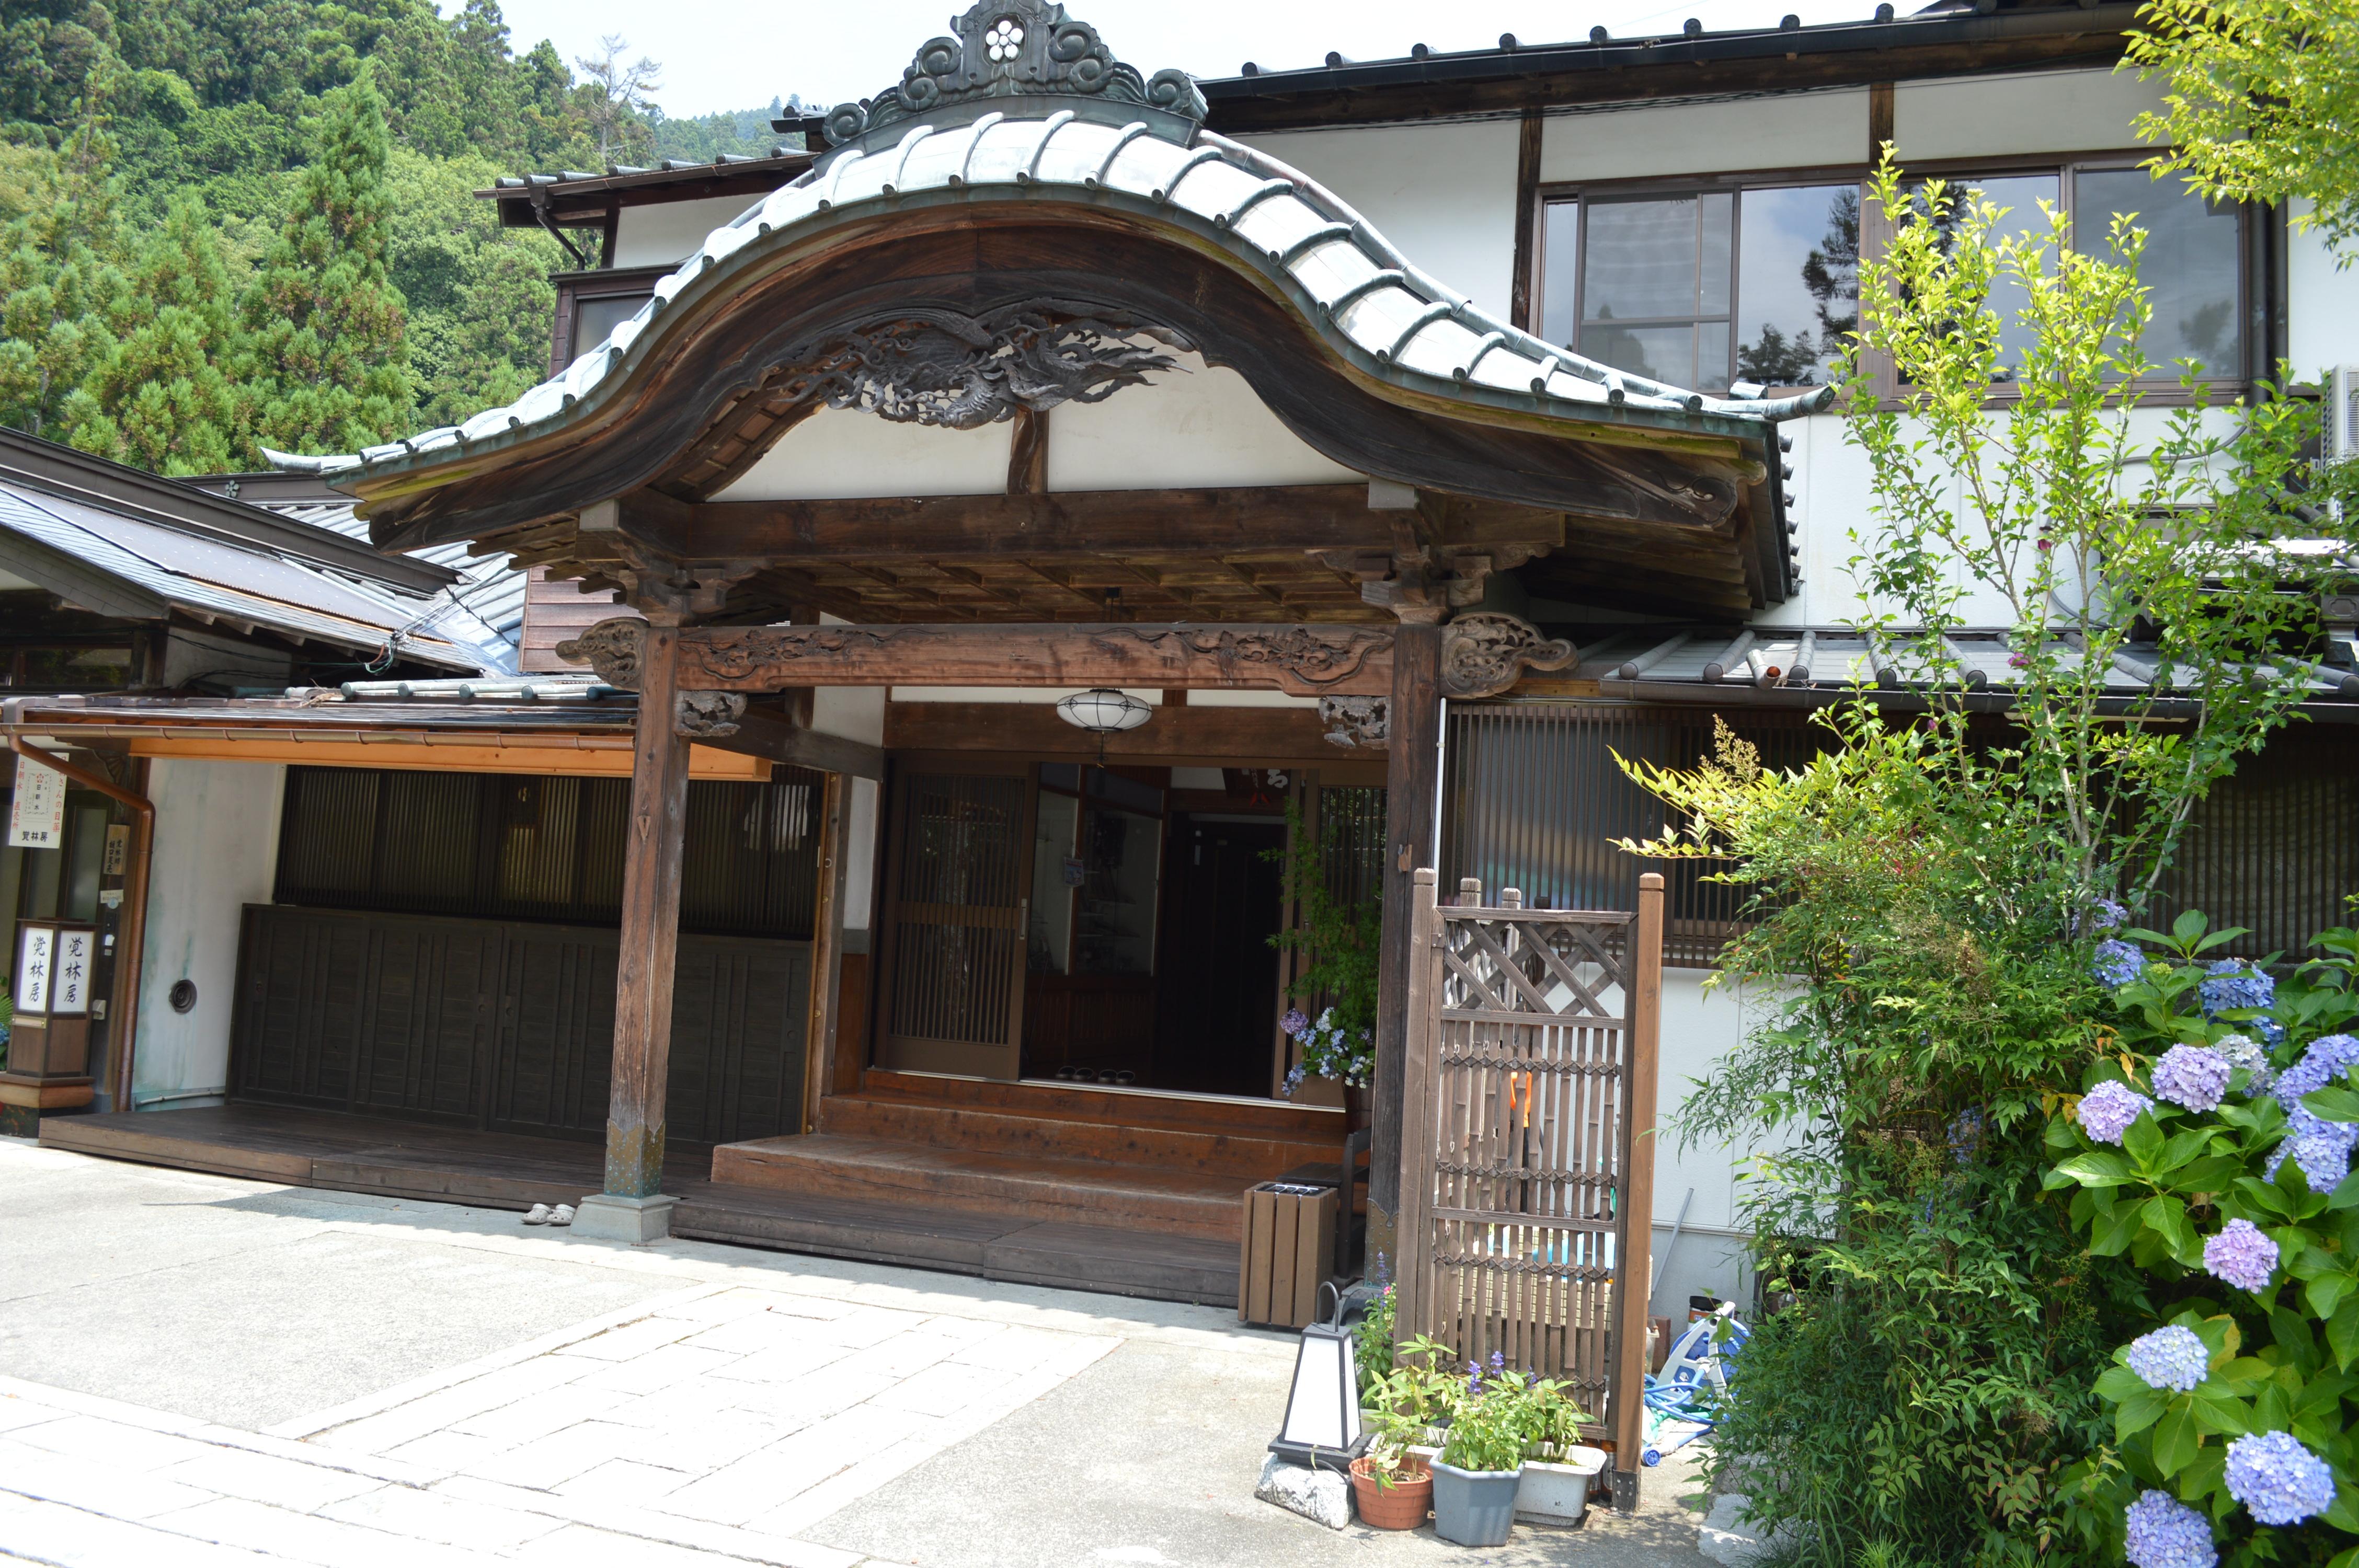 spirited away at shukubo kakurinbo temple inn close to mount fuji rh closetomountfuji com